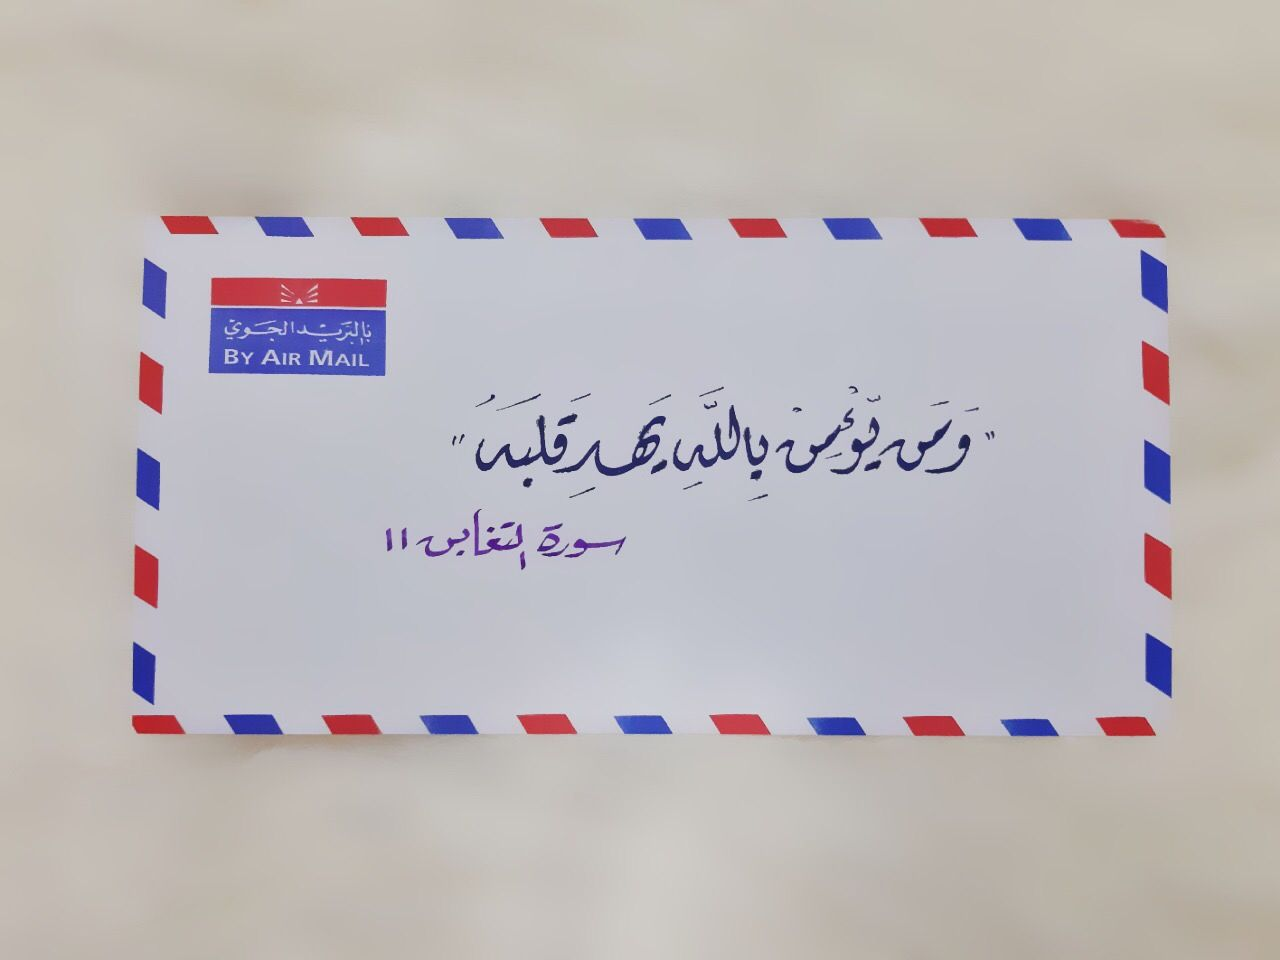 Quran اقرأ Quran Quotes Quran Quotes Inspirational Inspirational Quotes